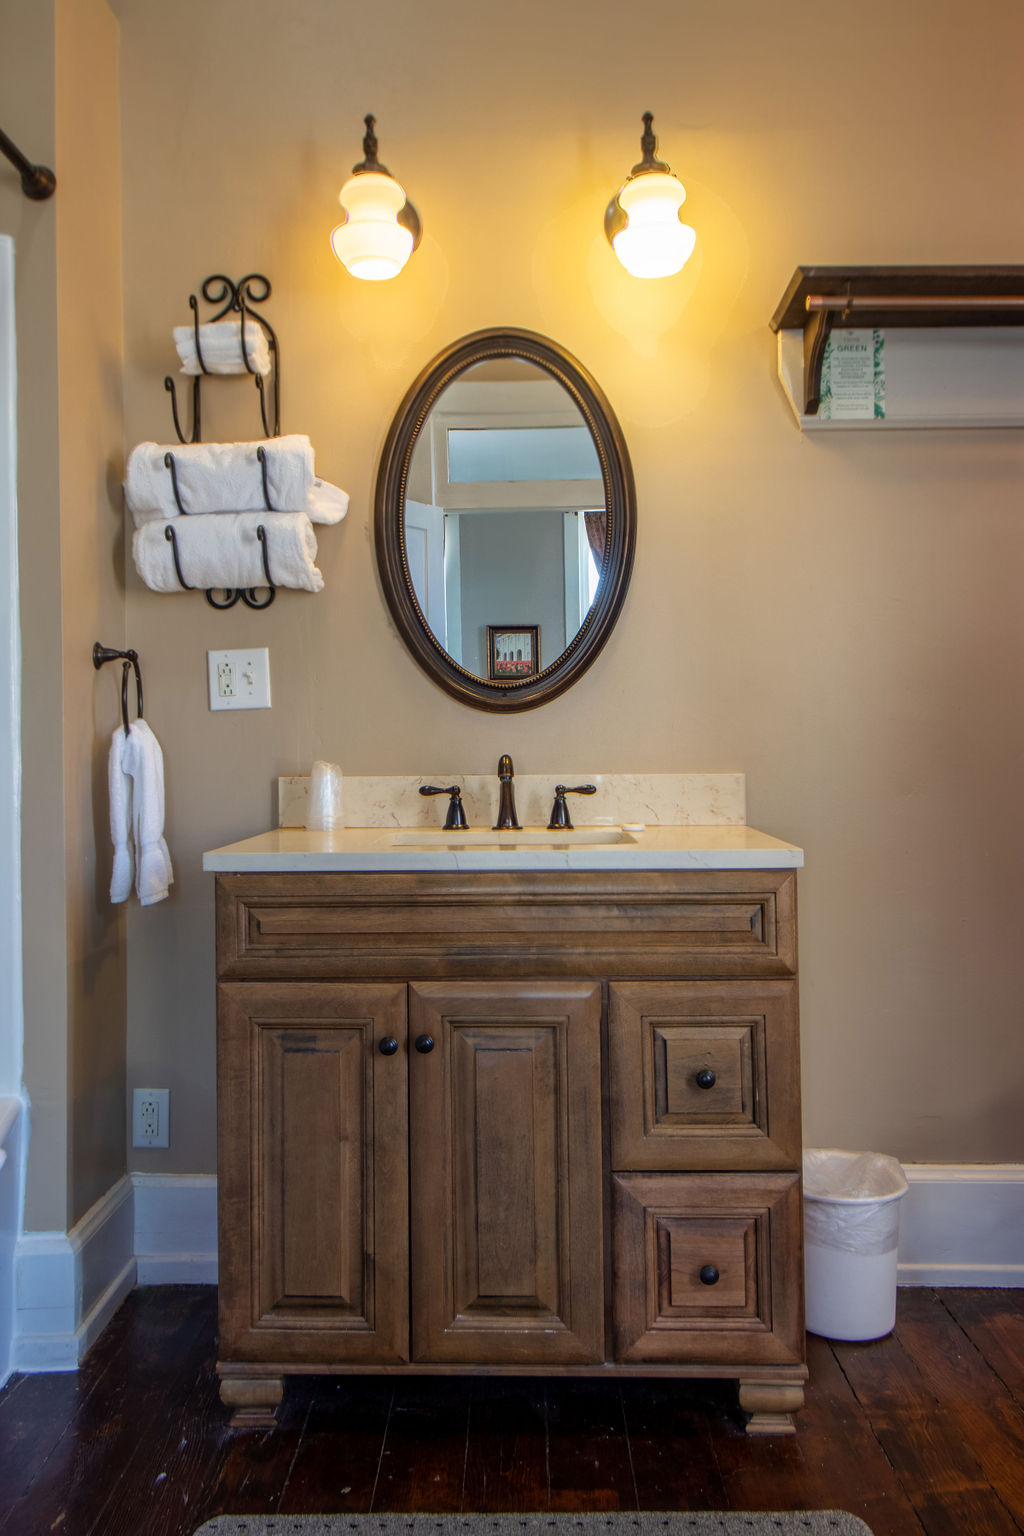 Nauvoo Hotel Bathroom sink and mirror